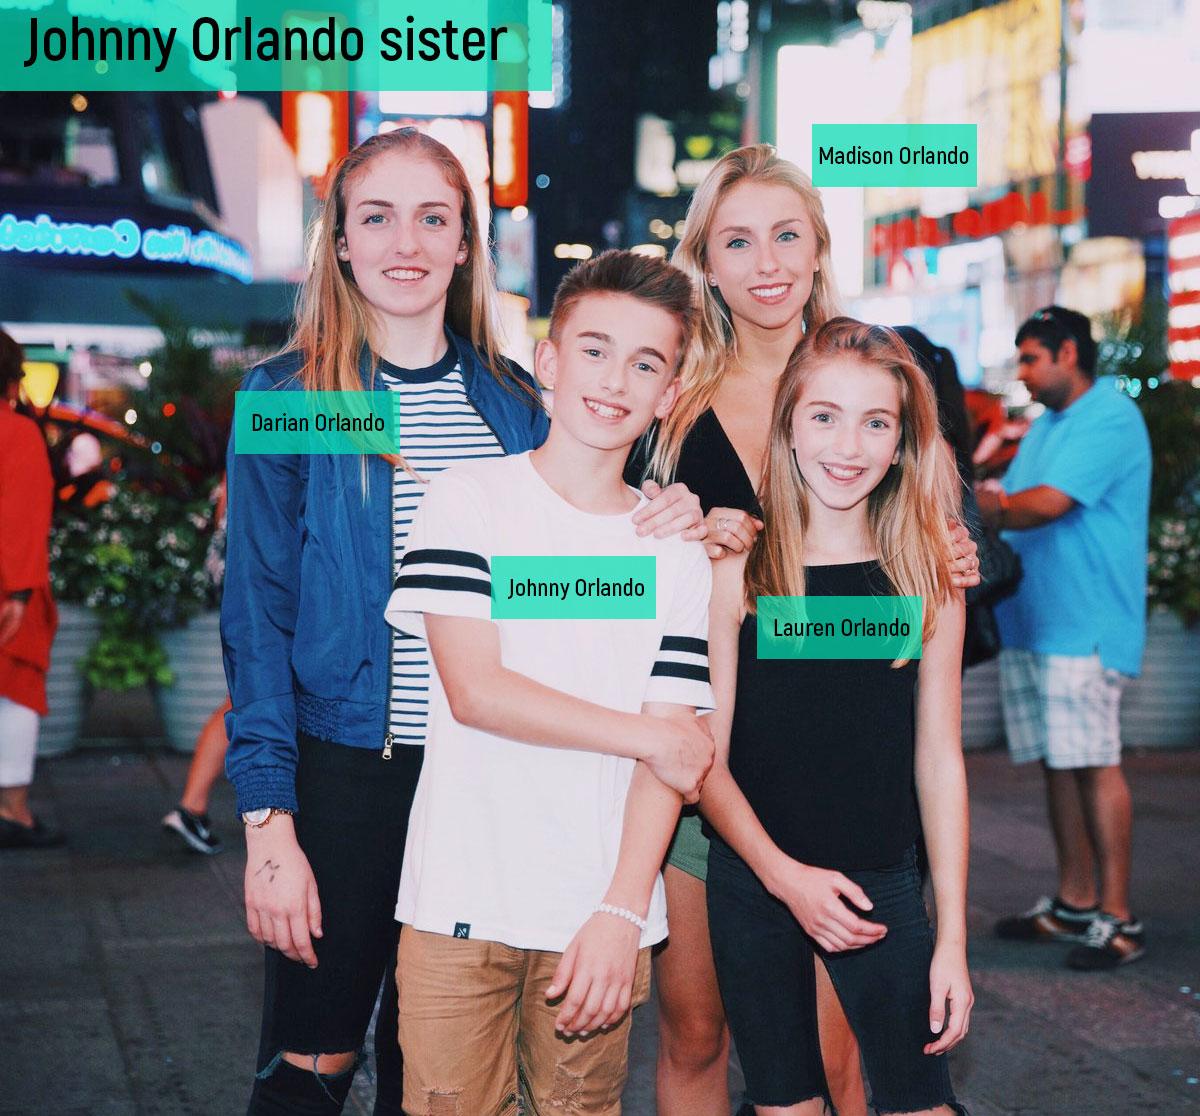 Johnny Orlando sister